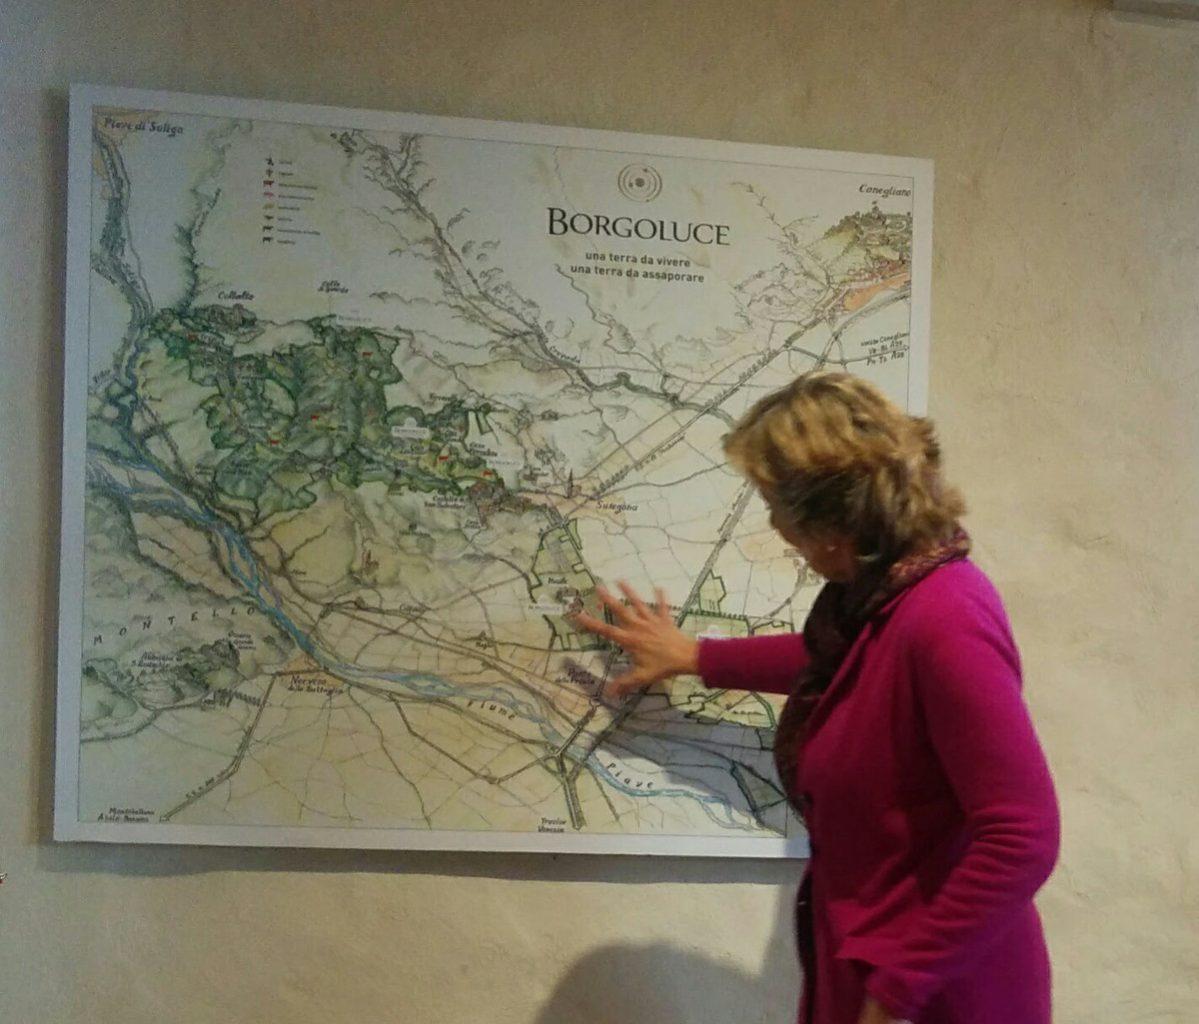 The estate of Borgoluce